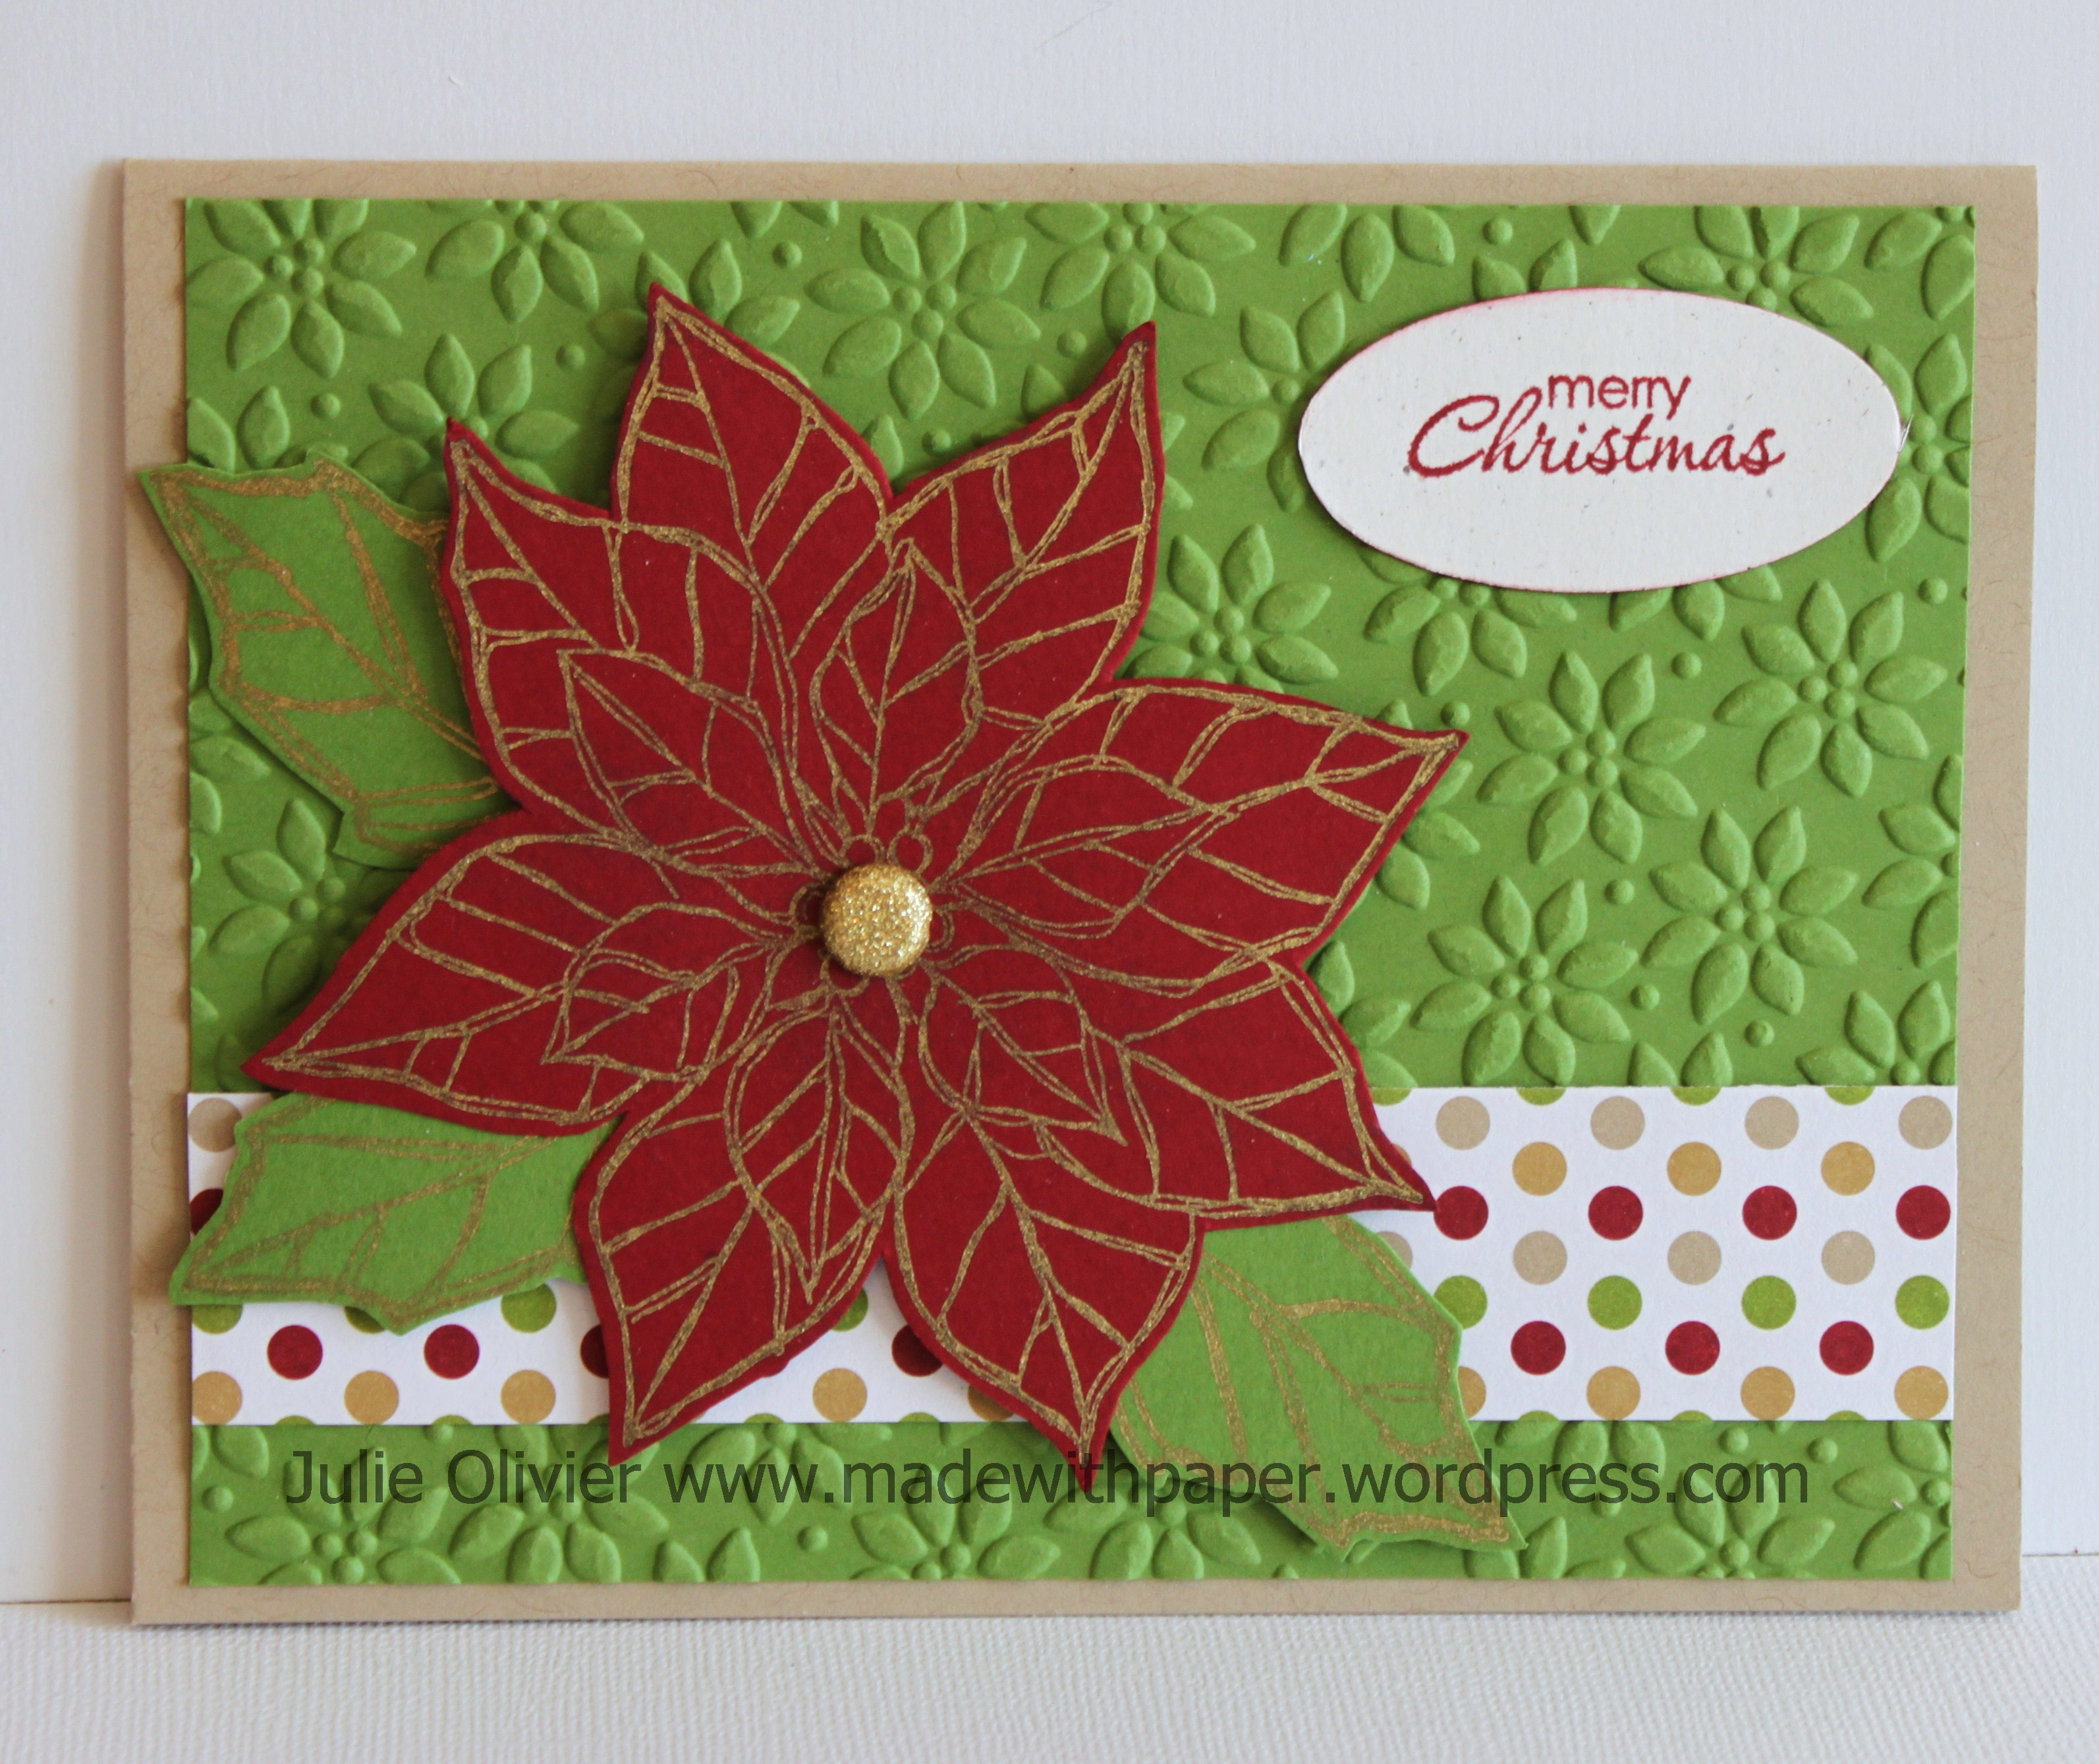 Joyful Christmas | Made with paper